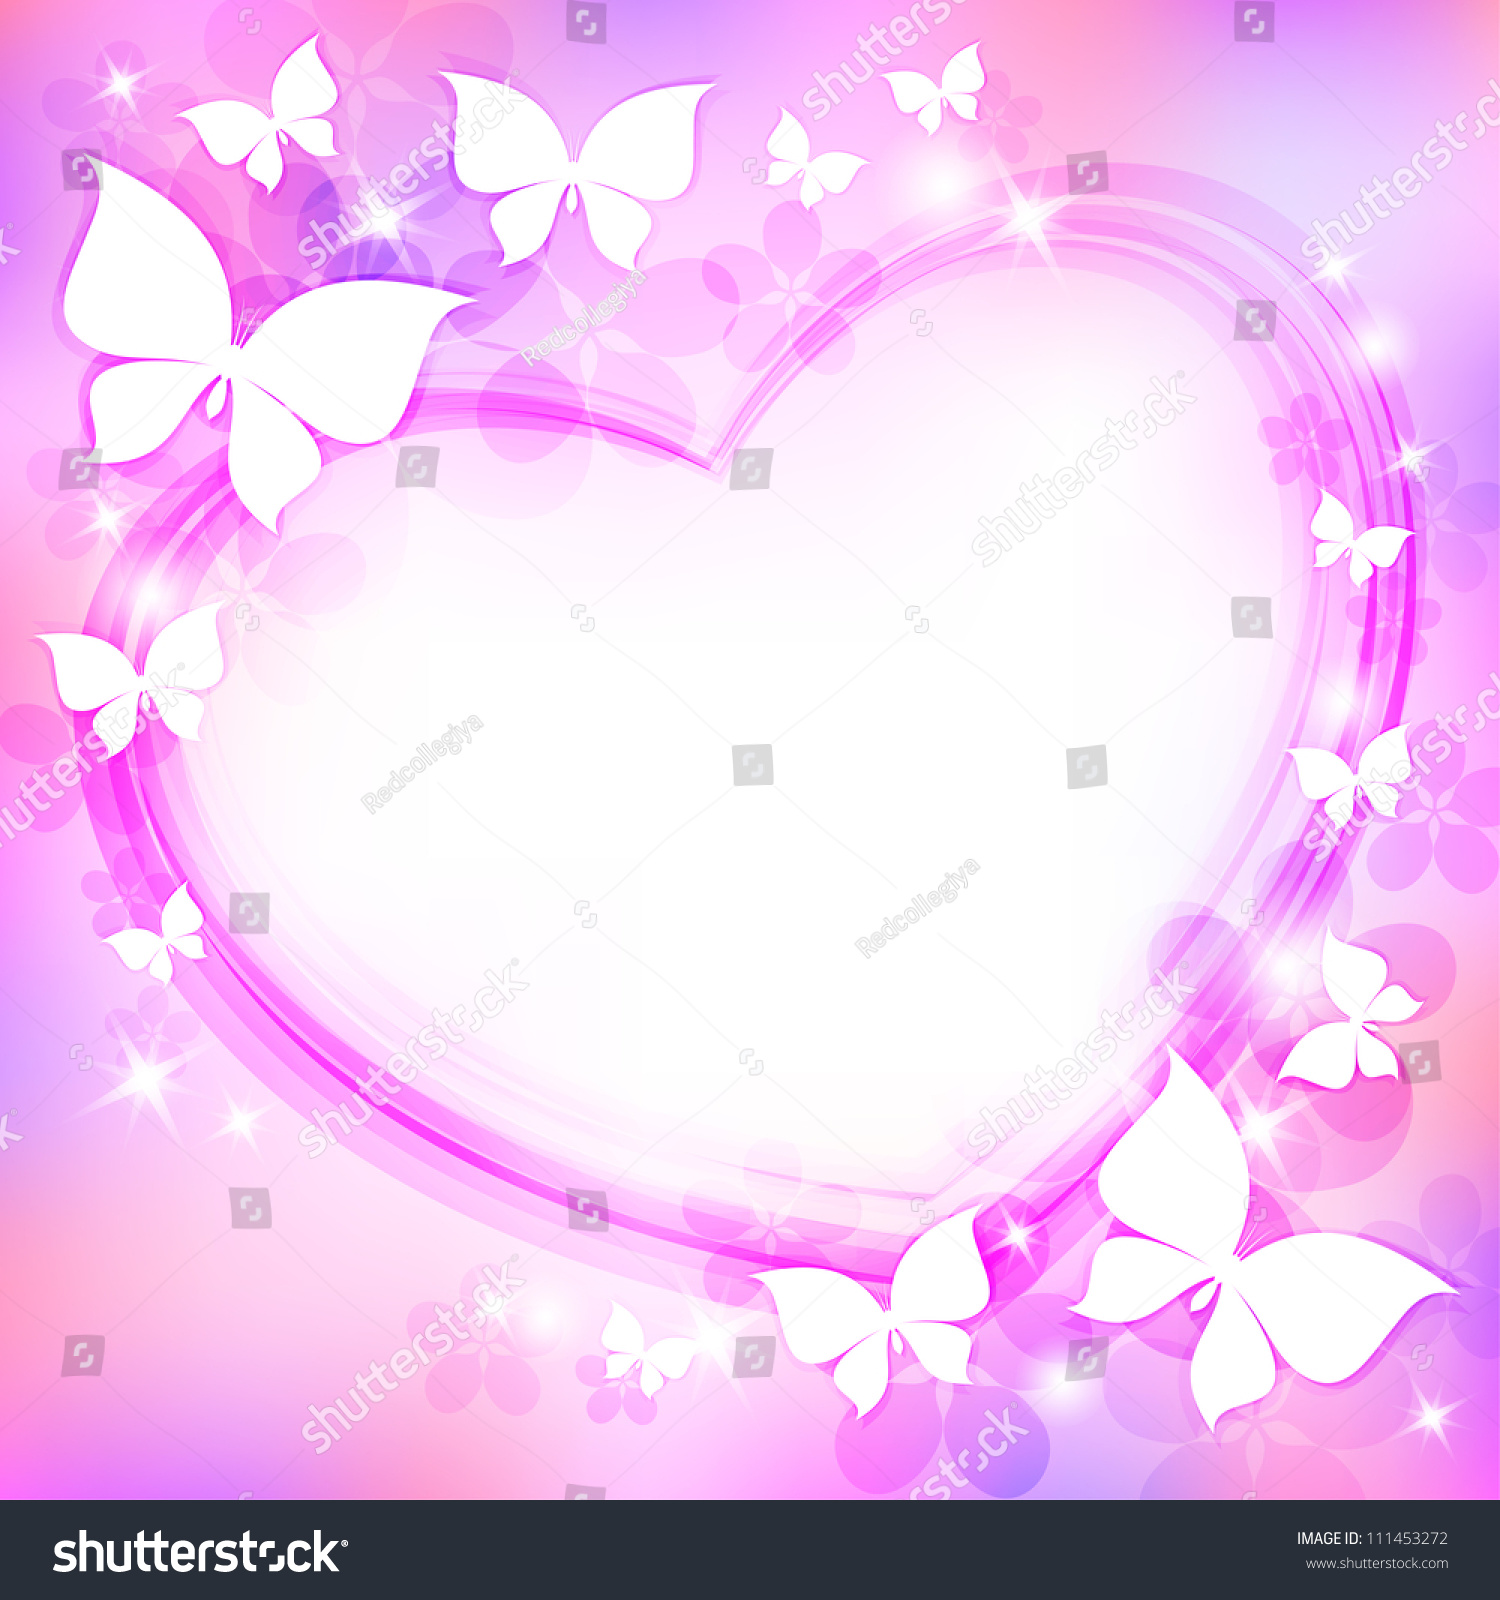 Beautiful Abstract Background Heart Butterflies Stars